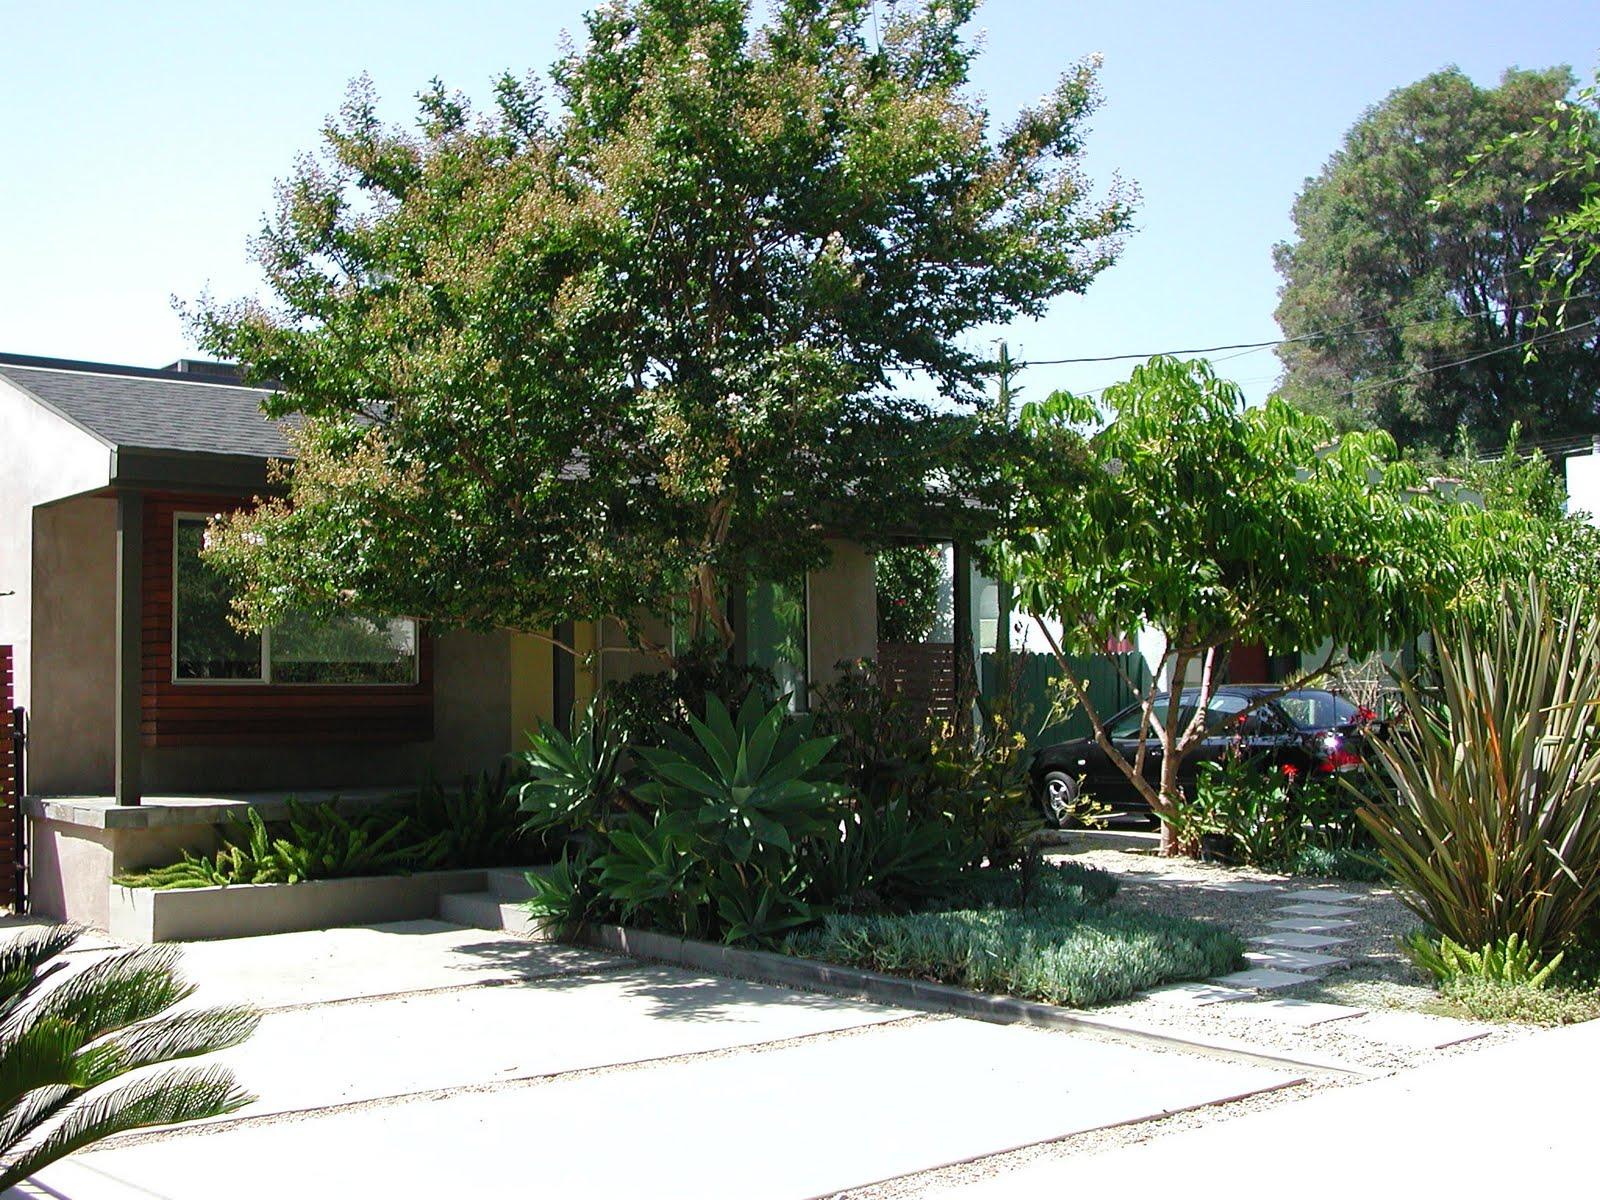 succulent front yard 28 images succulent front yard  : DSCN1705 from www.catworldusa.com size 1600 x 1200 jpeg 446kB